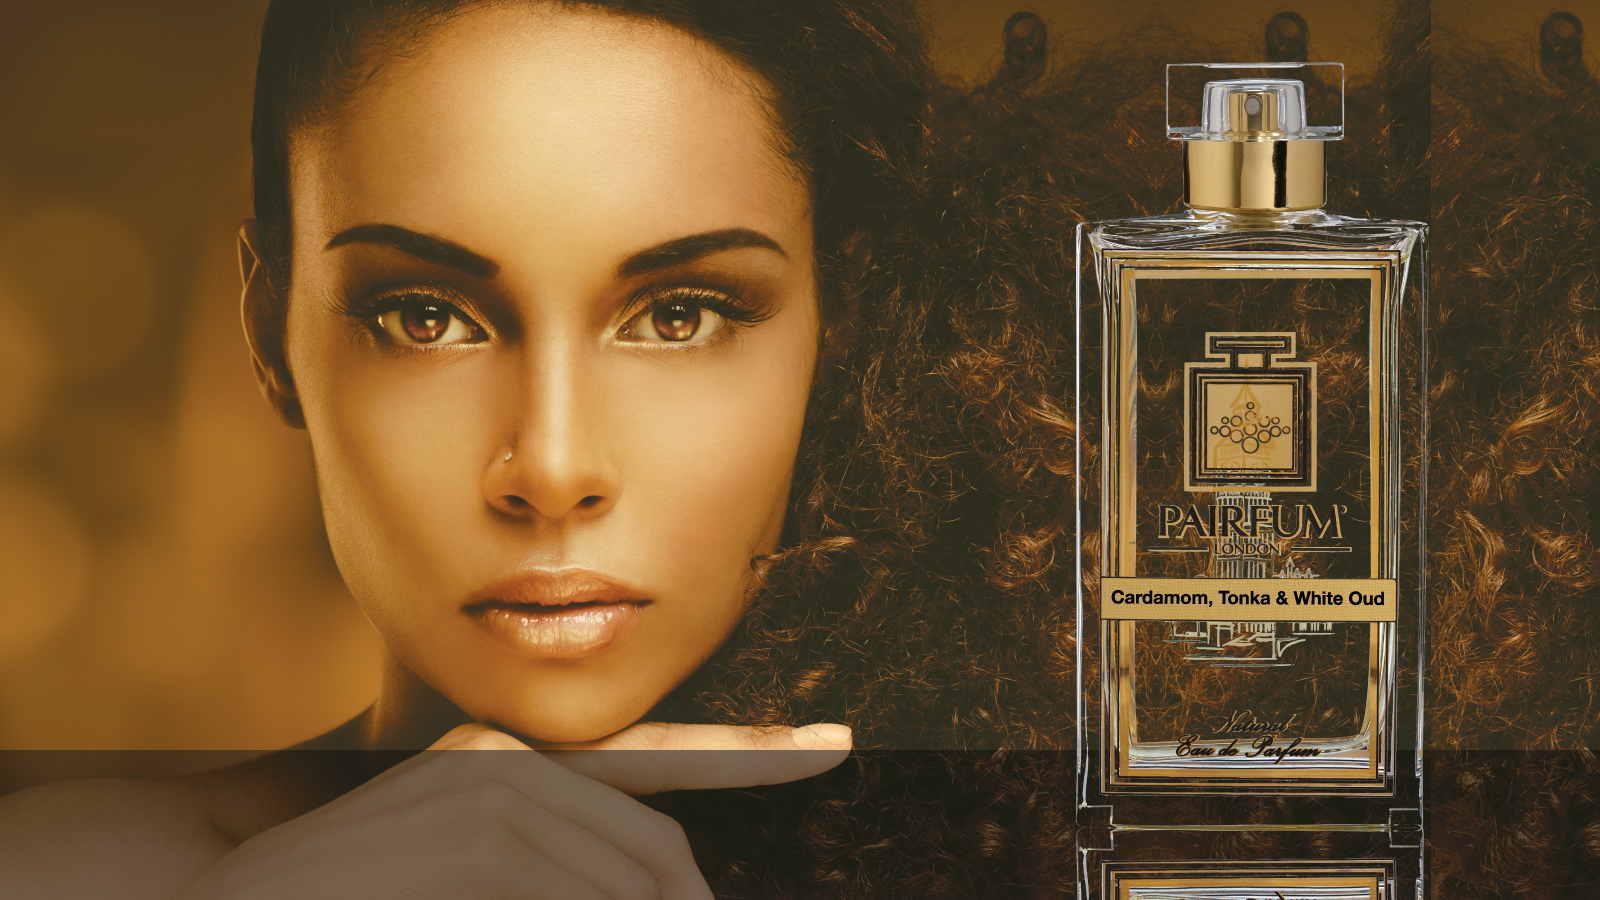 Eau De Parfum Person Reflection Cardamom Tonka White Oud Woman Finger 16 9